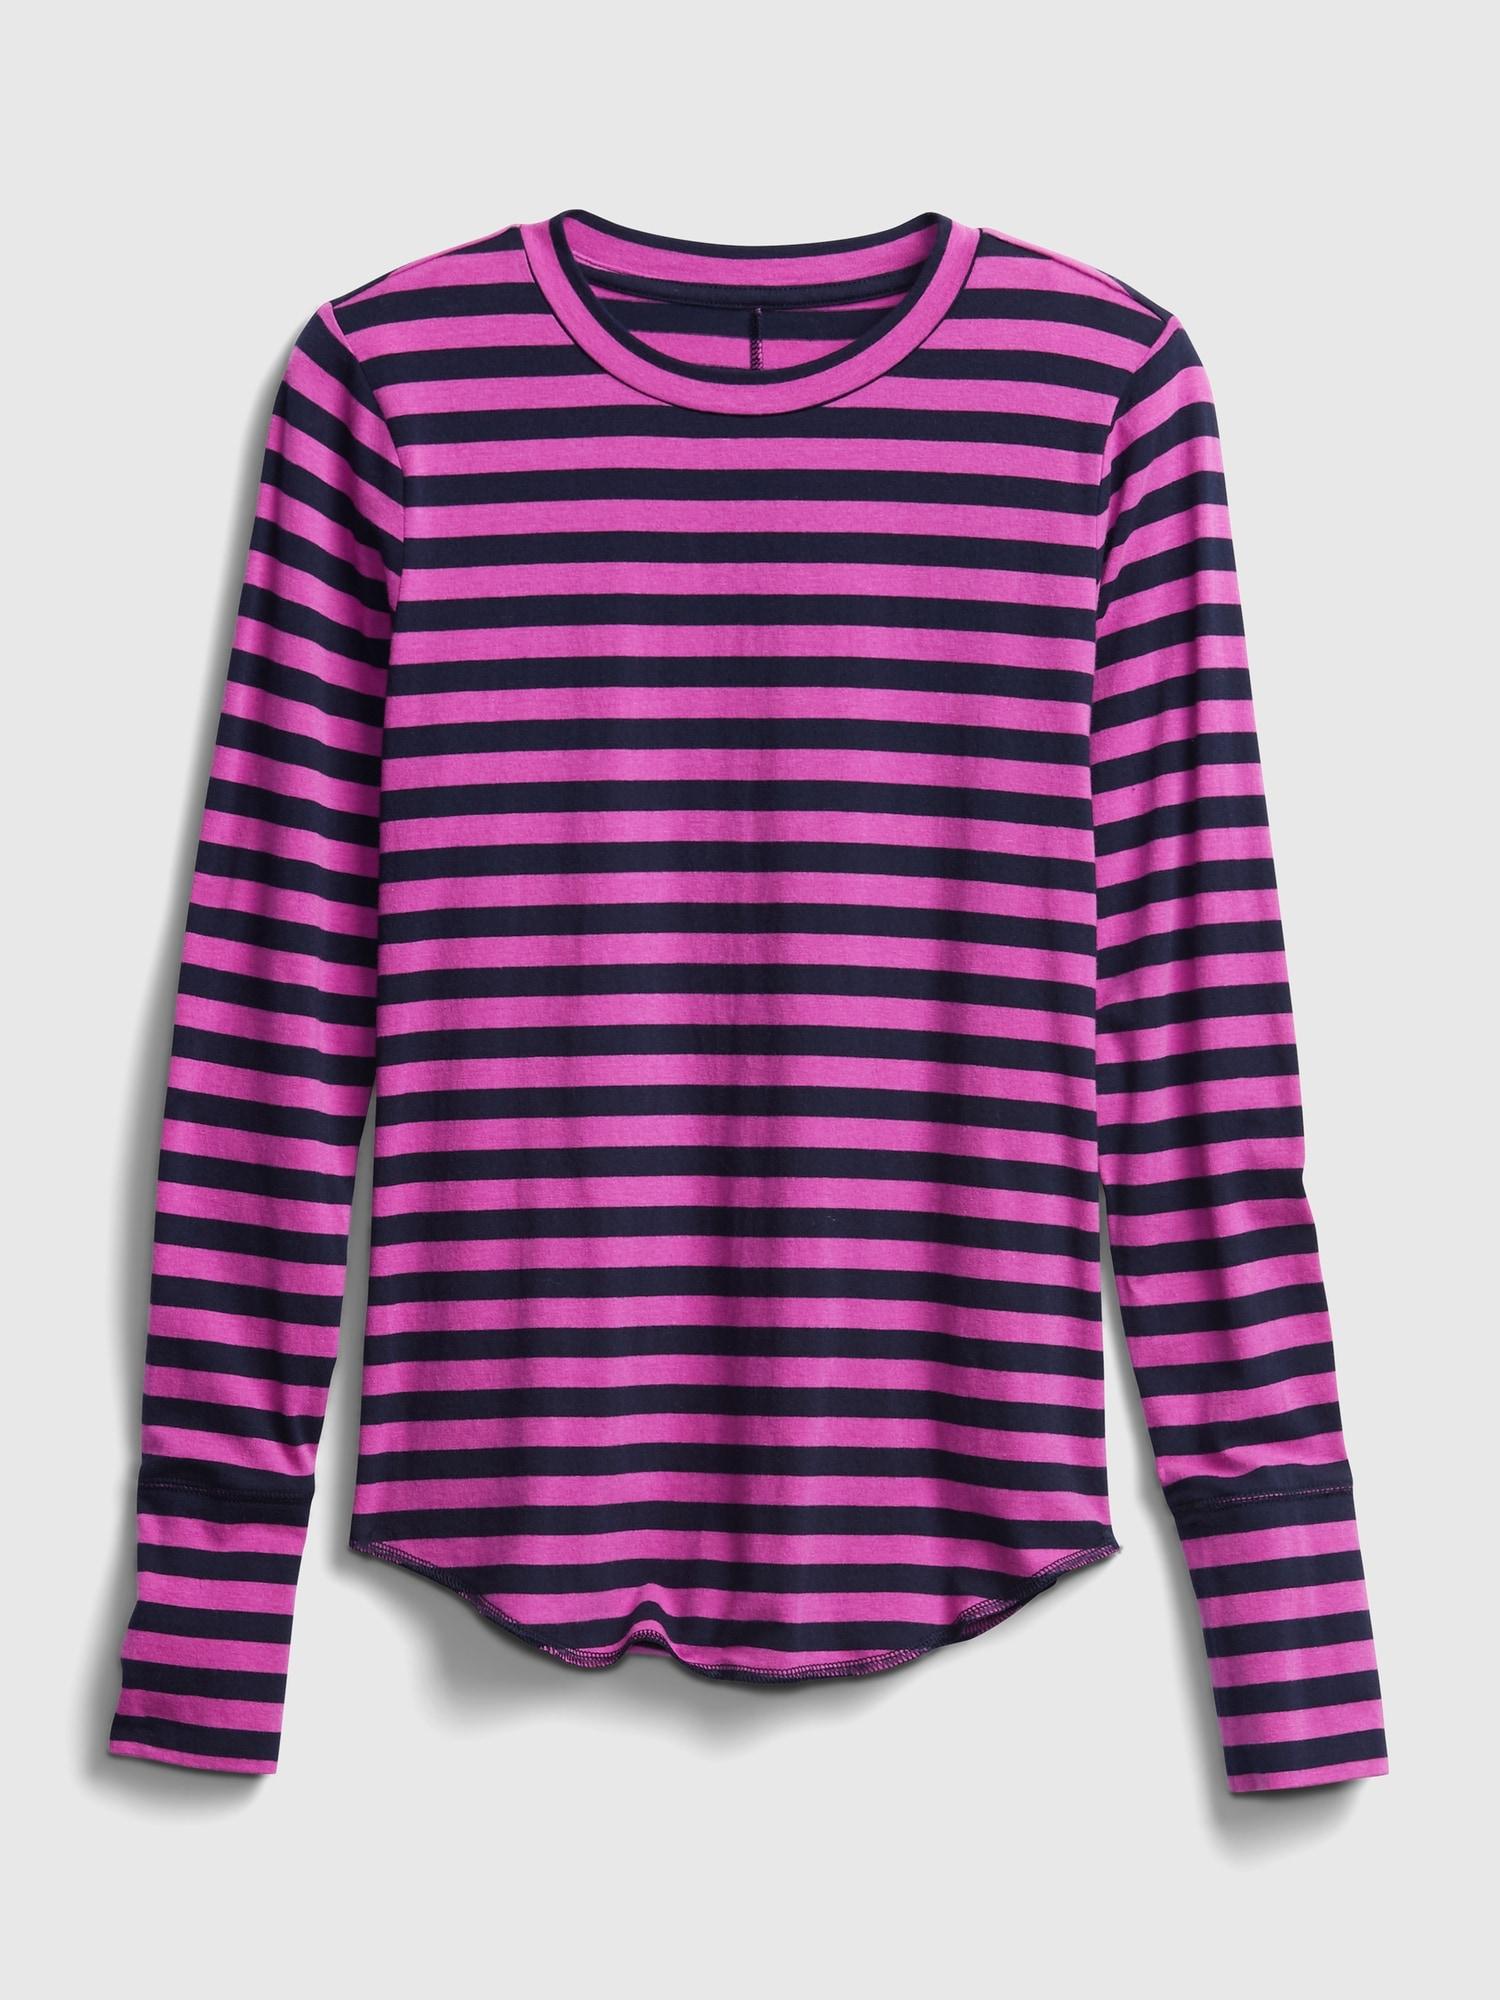 GAP Koszulki, topy damskie fioletowy